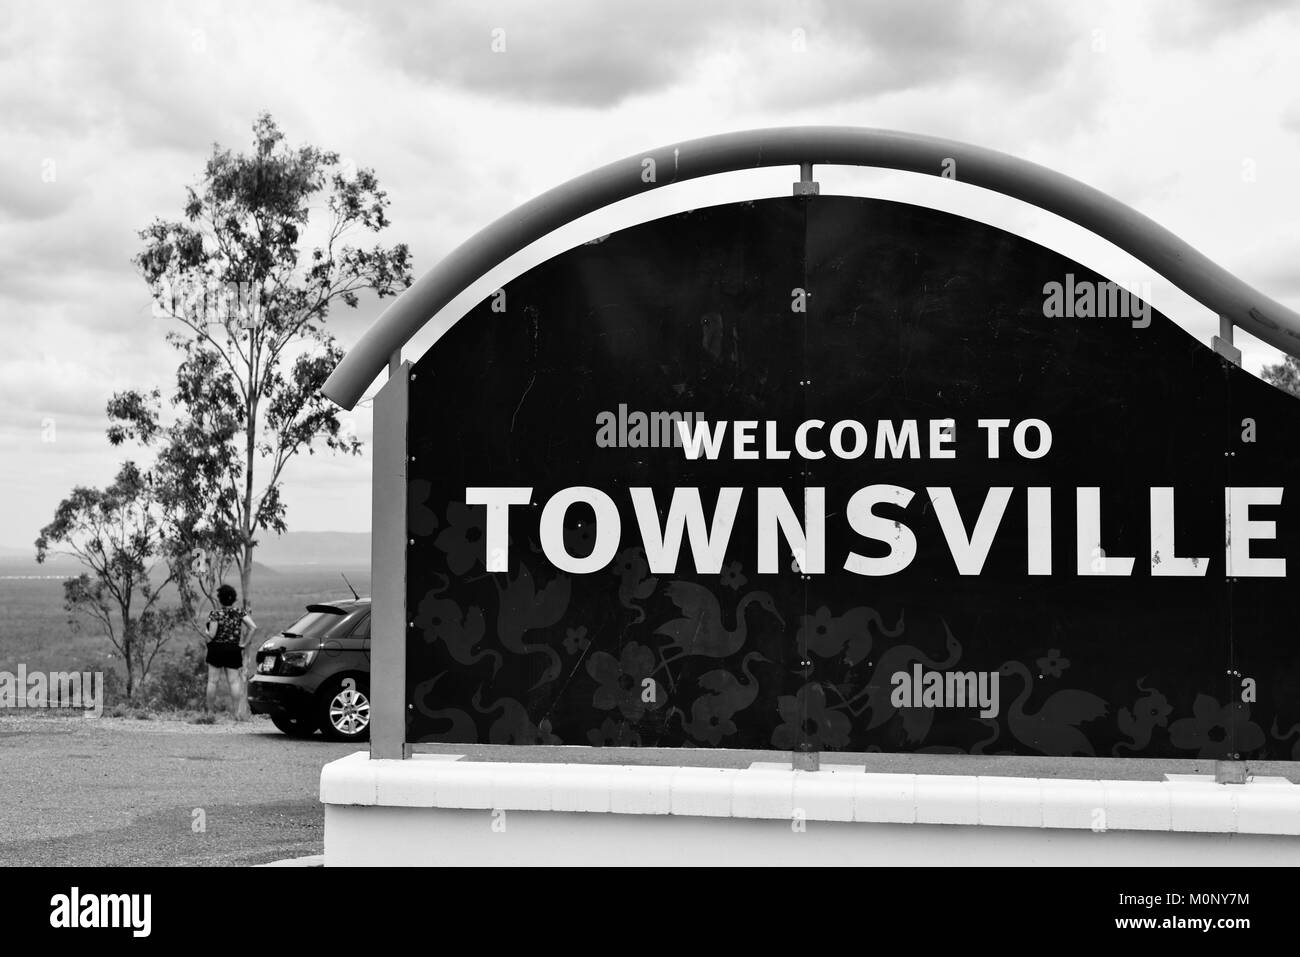 Welcome to Townsville sign at the Herveys Range lookout, Hervey Range, Queensland, Australia - Stock Image